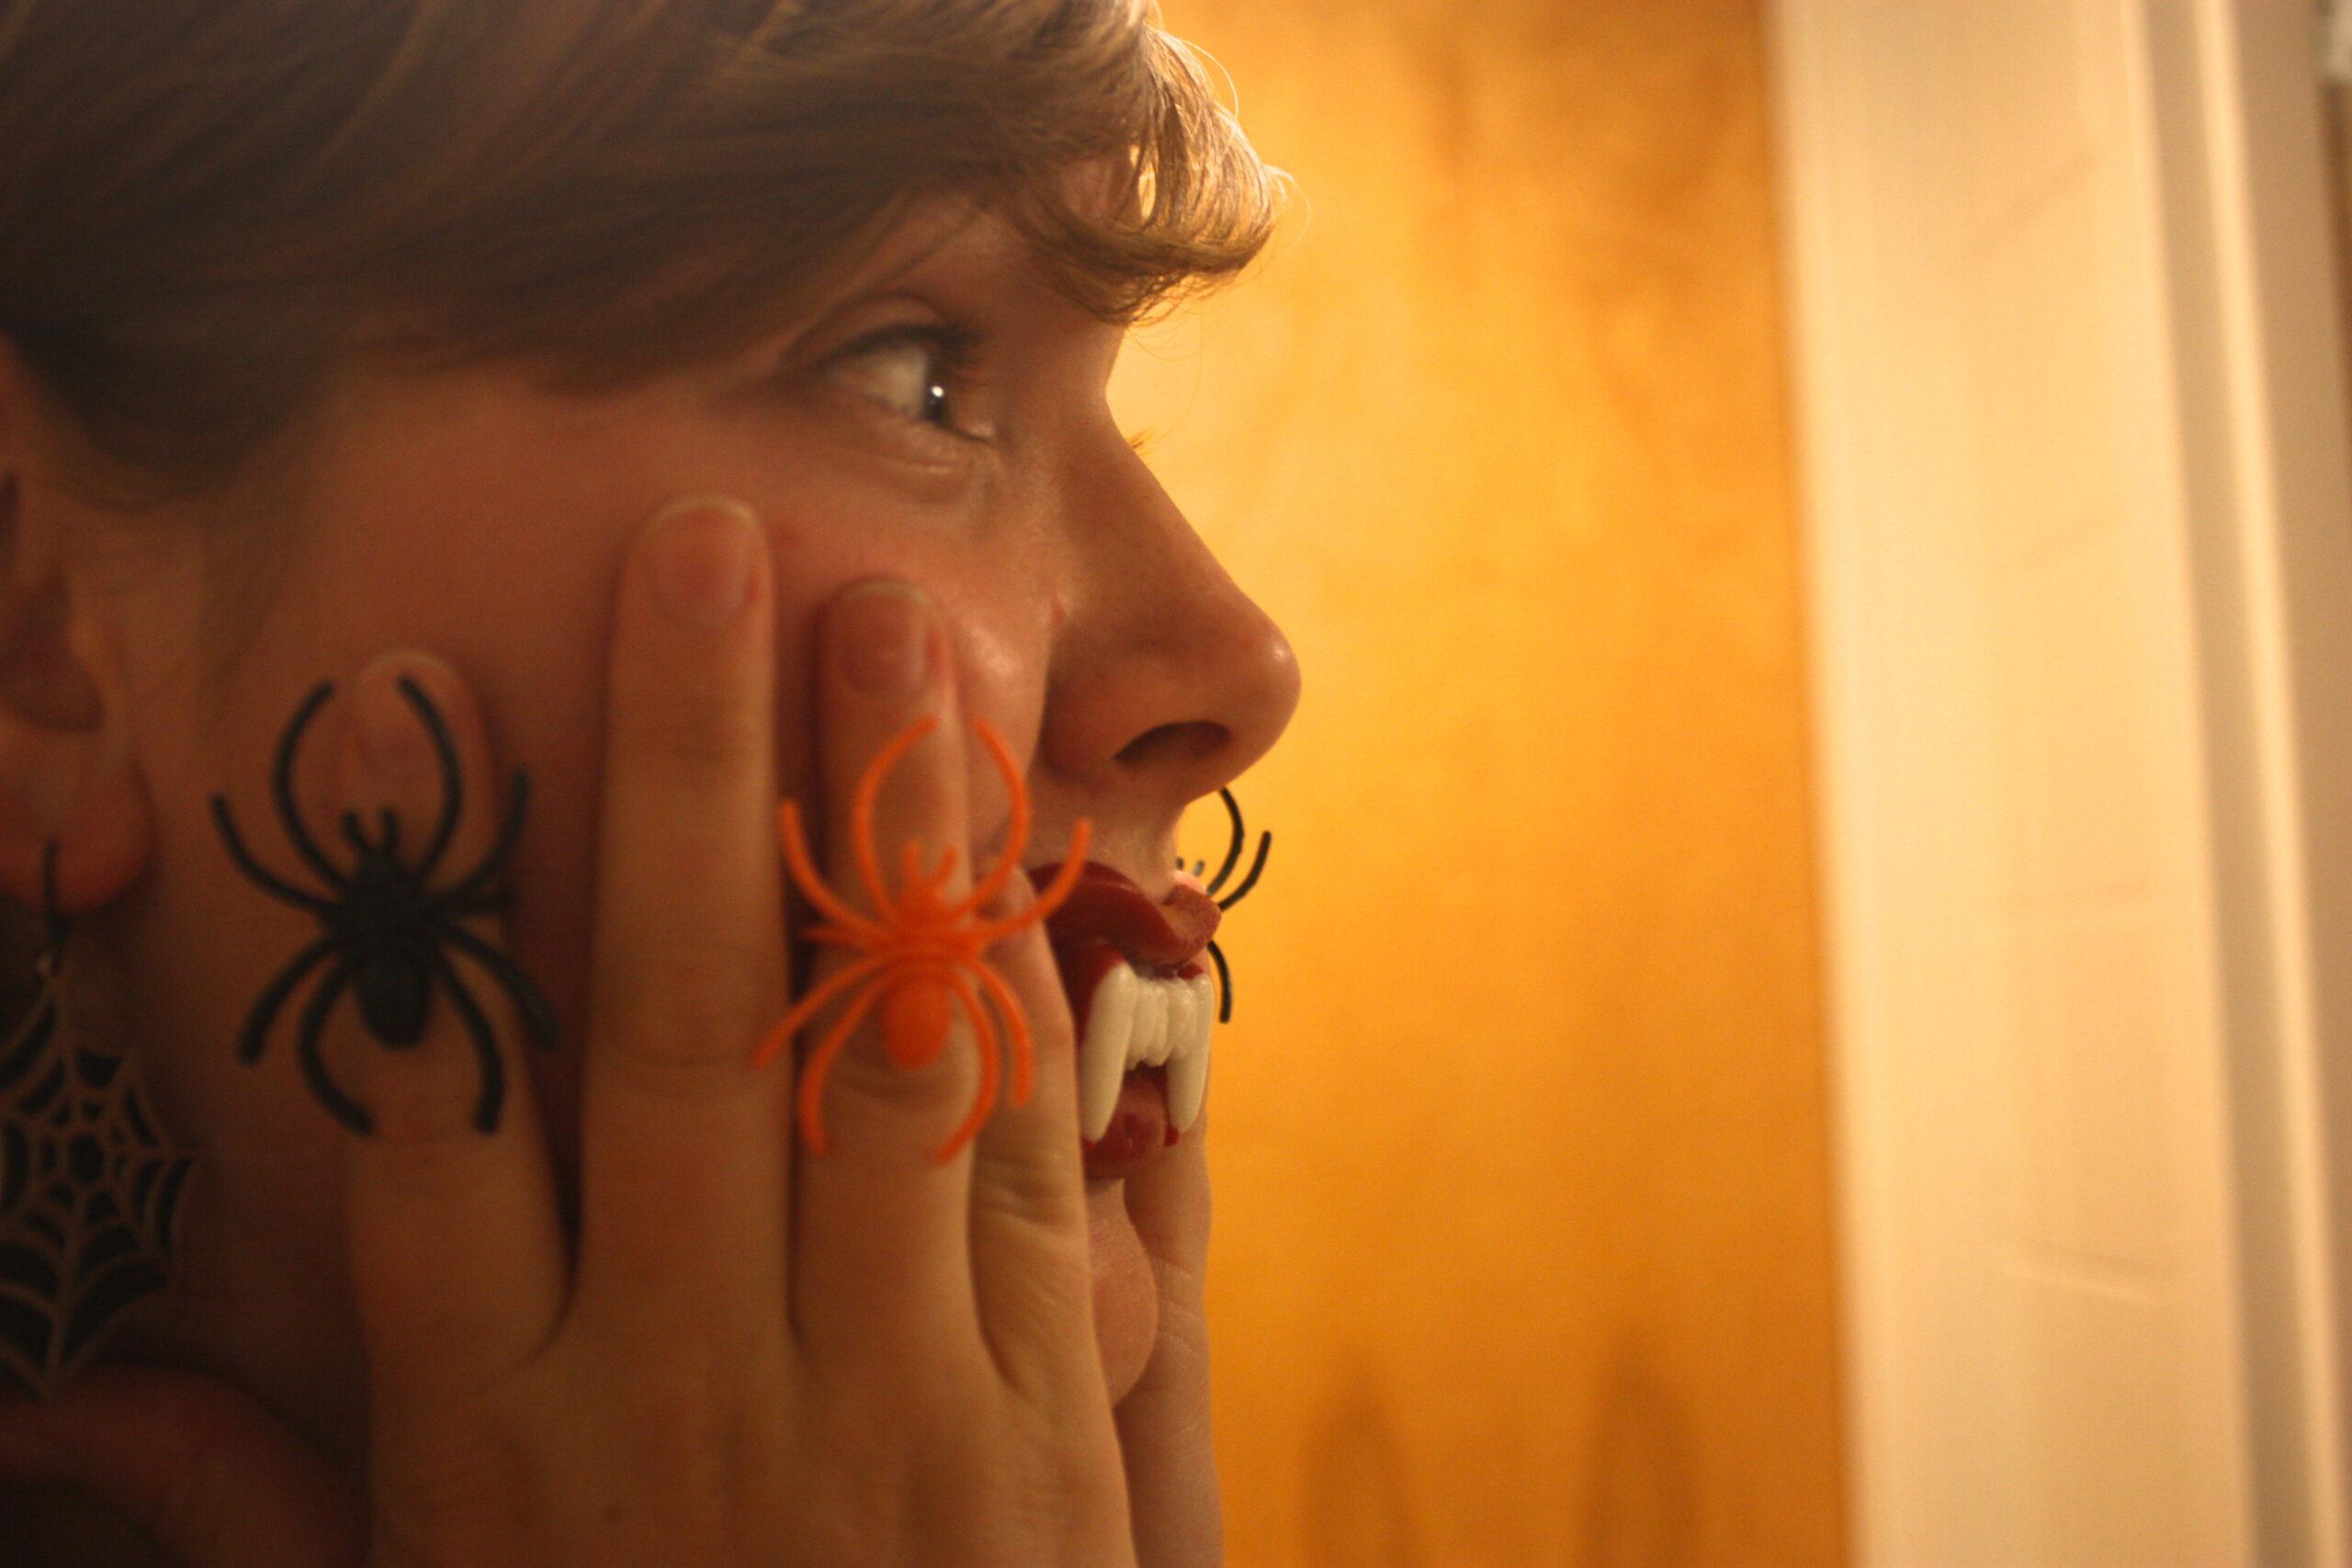 Elizabeth Franks-North wears a variety of spider rings